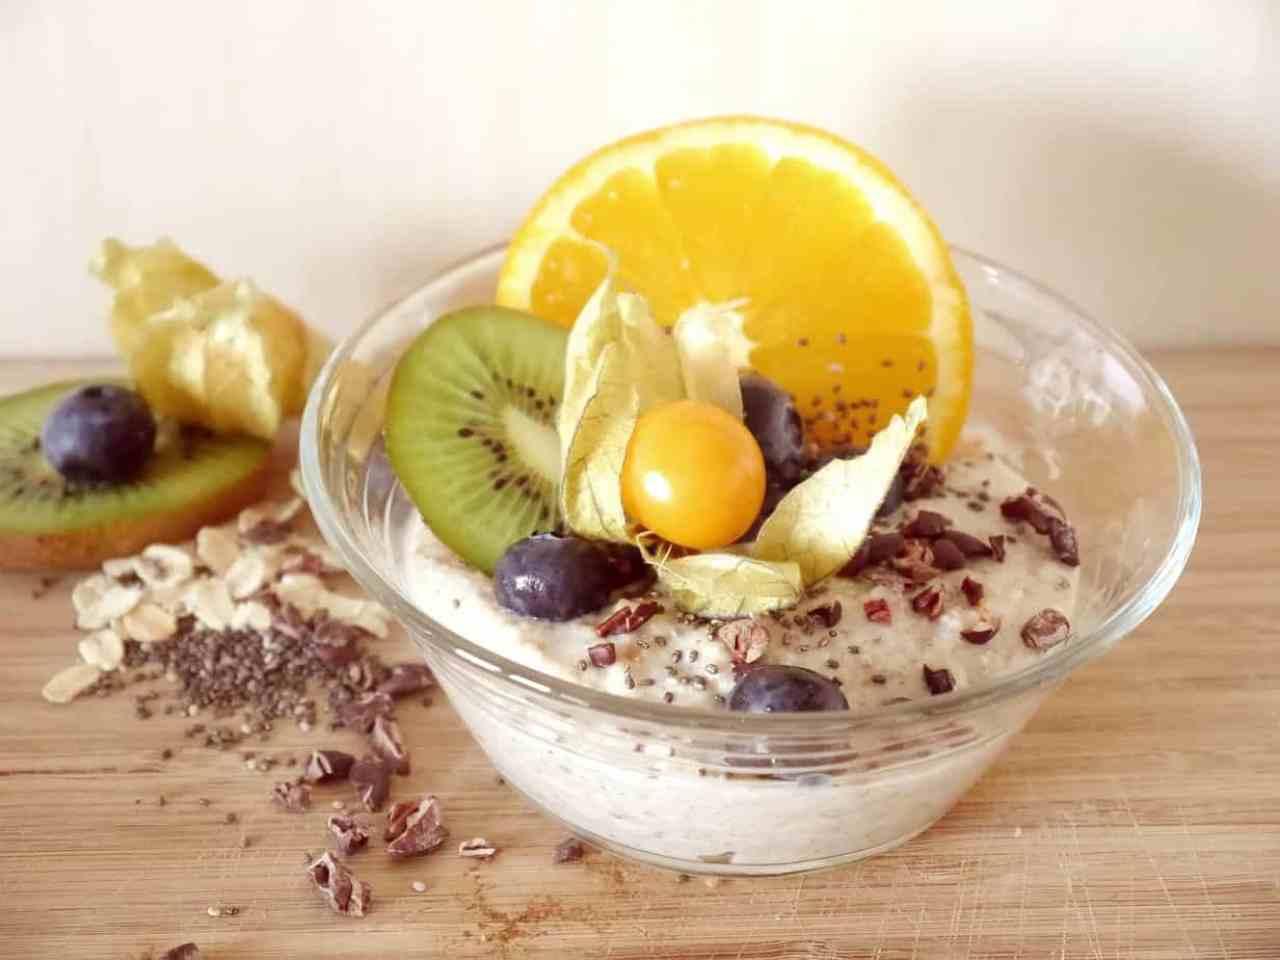 Cacao nibs on porridge